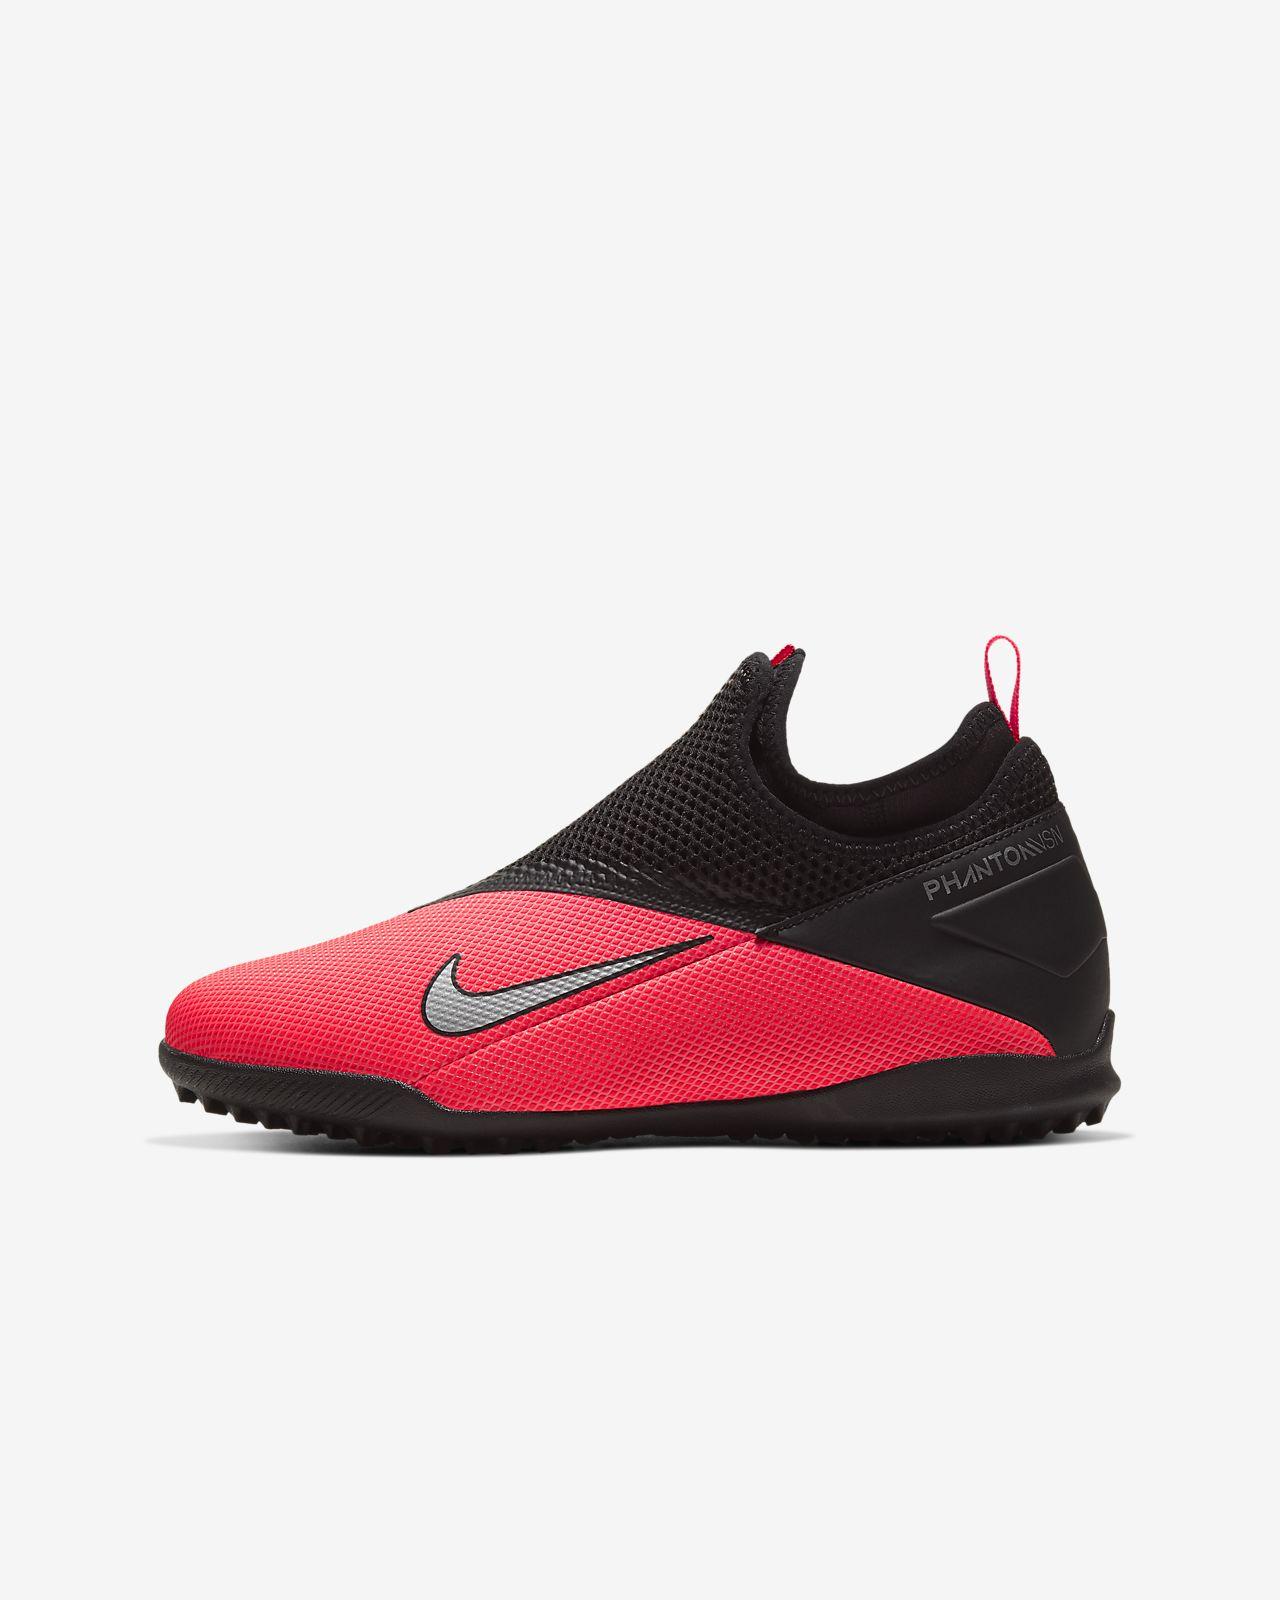 Nike JrPhantom VSN 2 Academy DF TF 暗煞系列大童人造场地足球童鞋